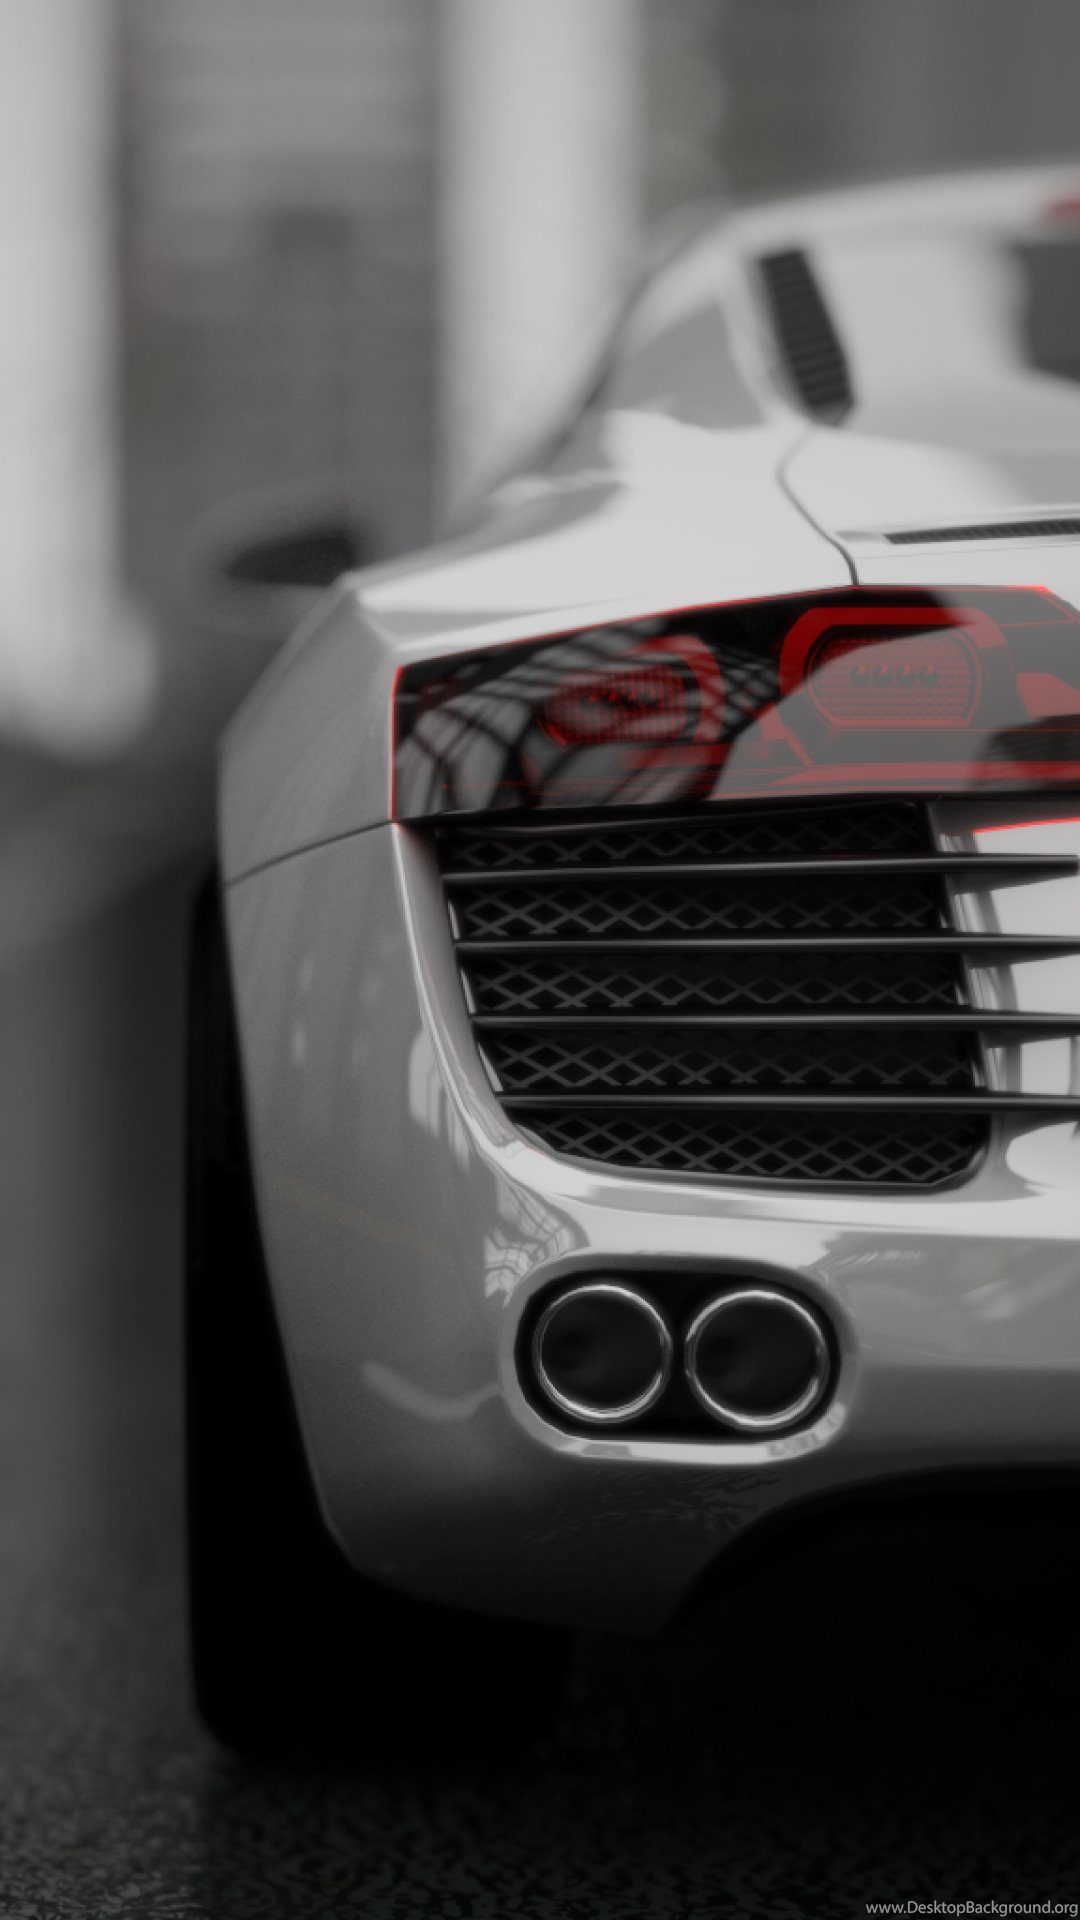 Audi R8 Wallpaper Hd Auto Moto Audi Iphone 6 Plus 1080x1920